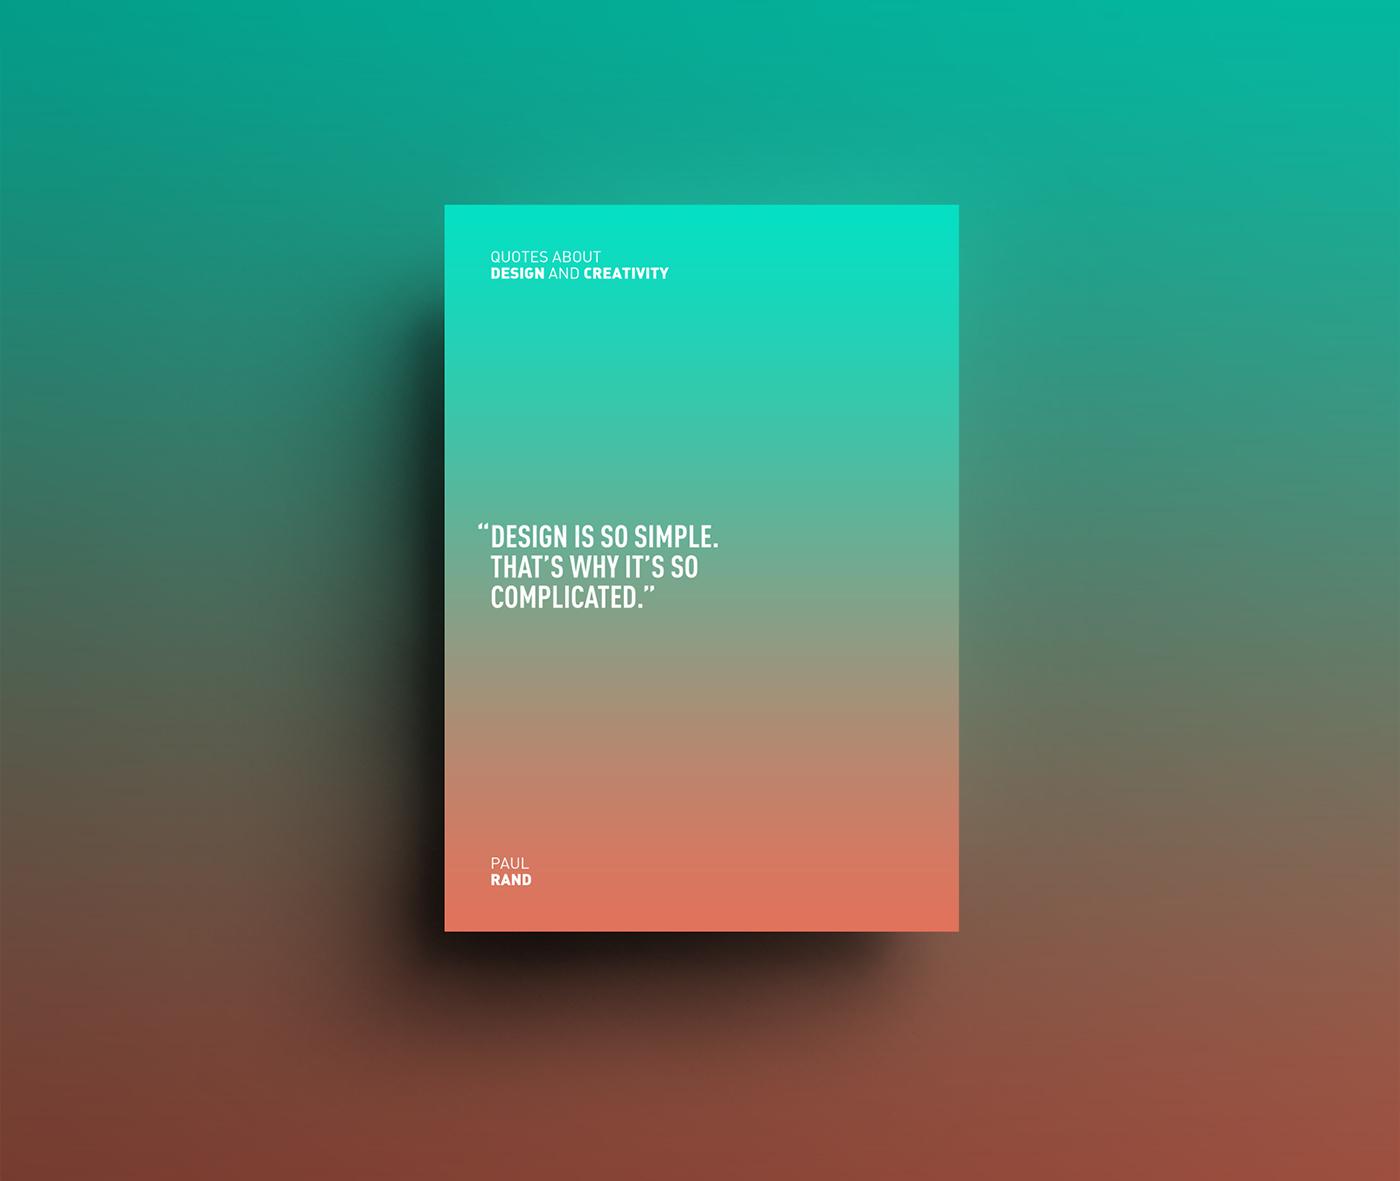 Adobe Portfolio design poster posters gradient colors color Shades visual Layout minimal fresh Quotes quote designquotes